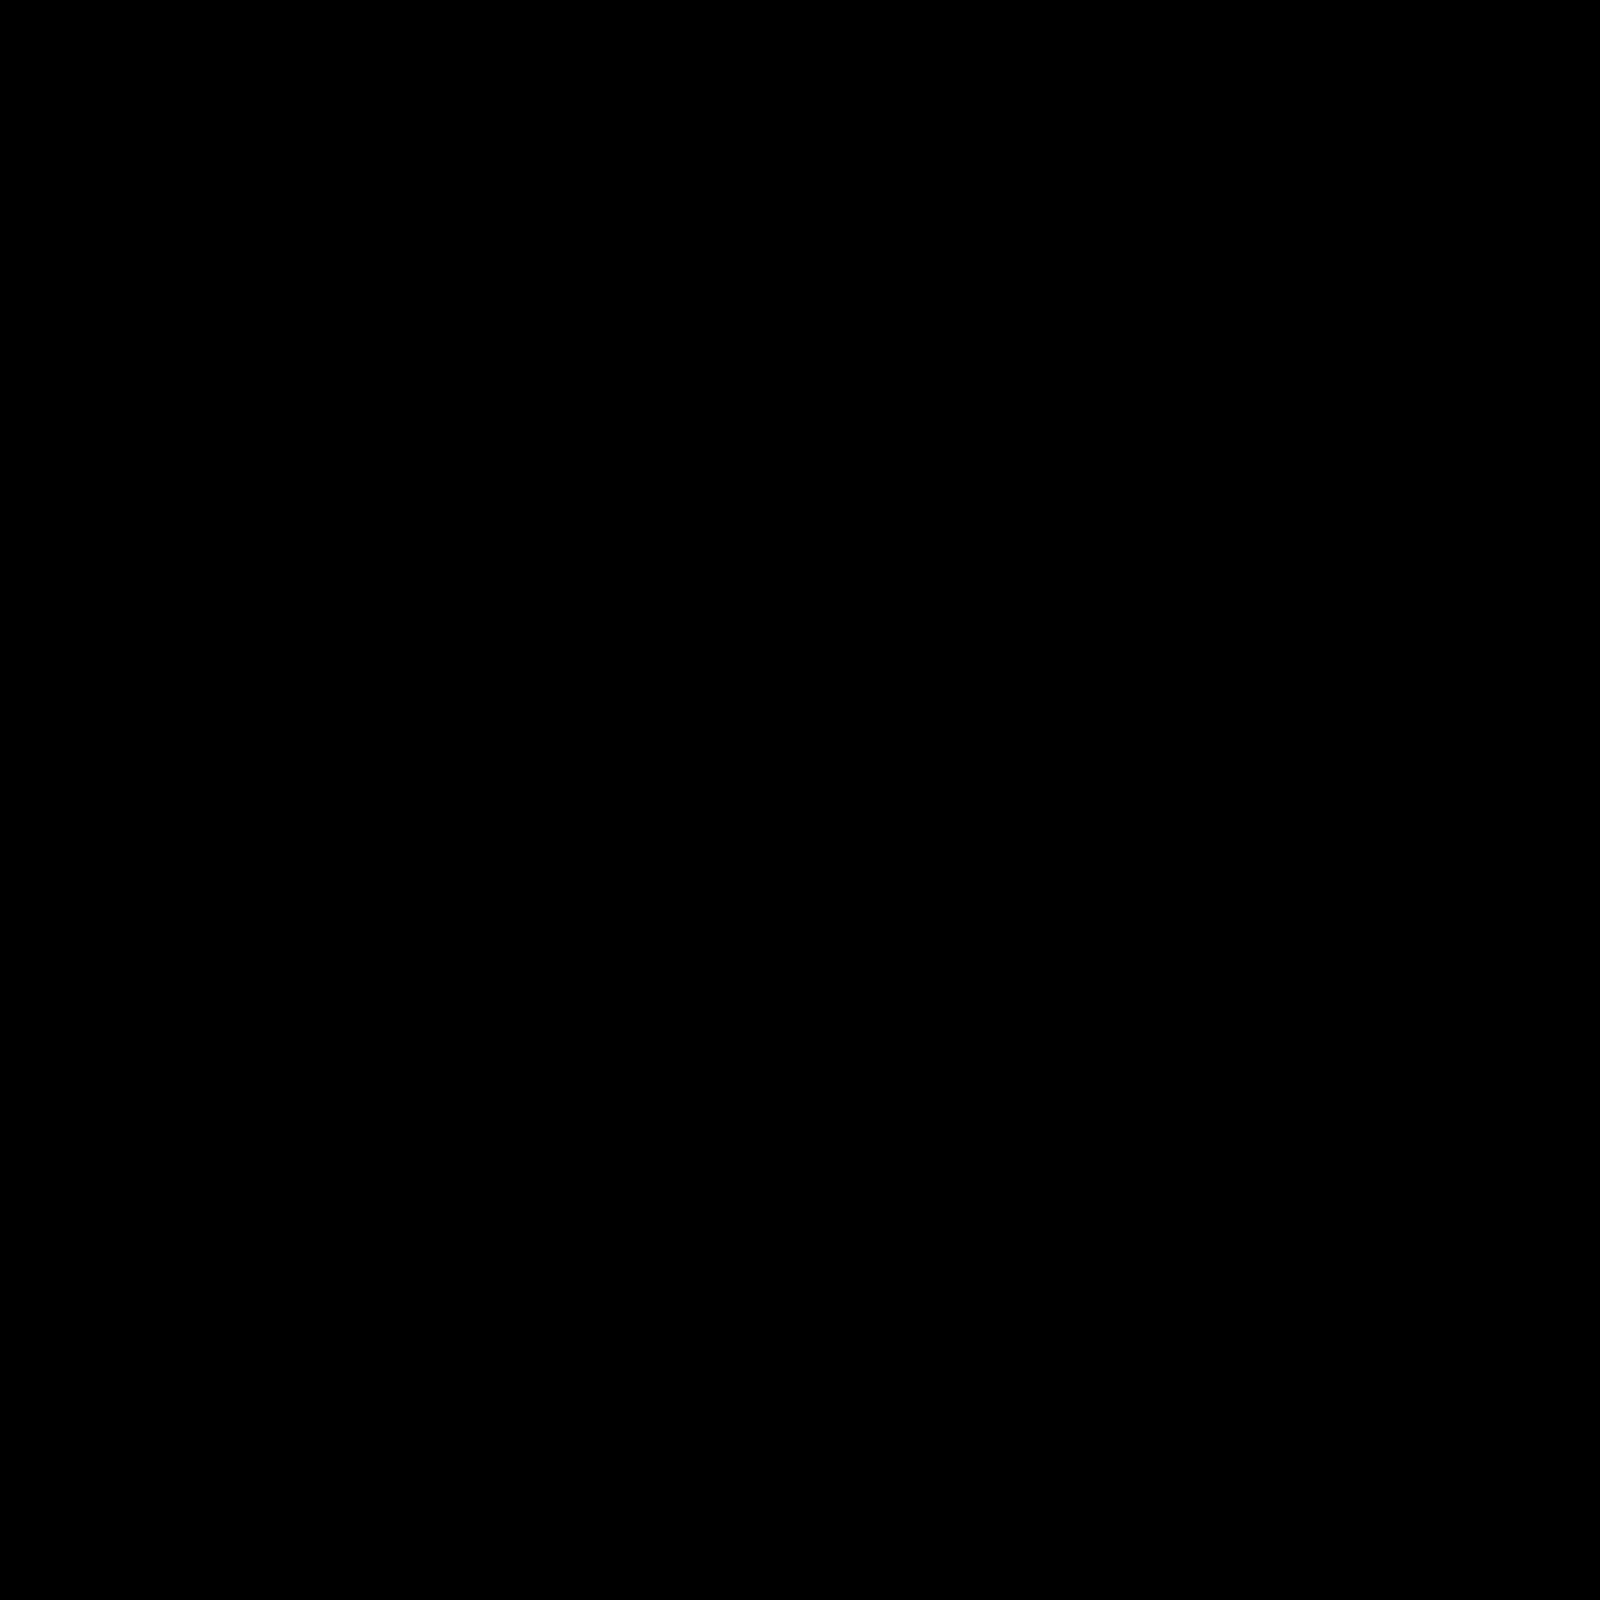 1600x1600 Caduceus Medical Icon